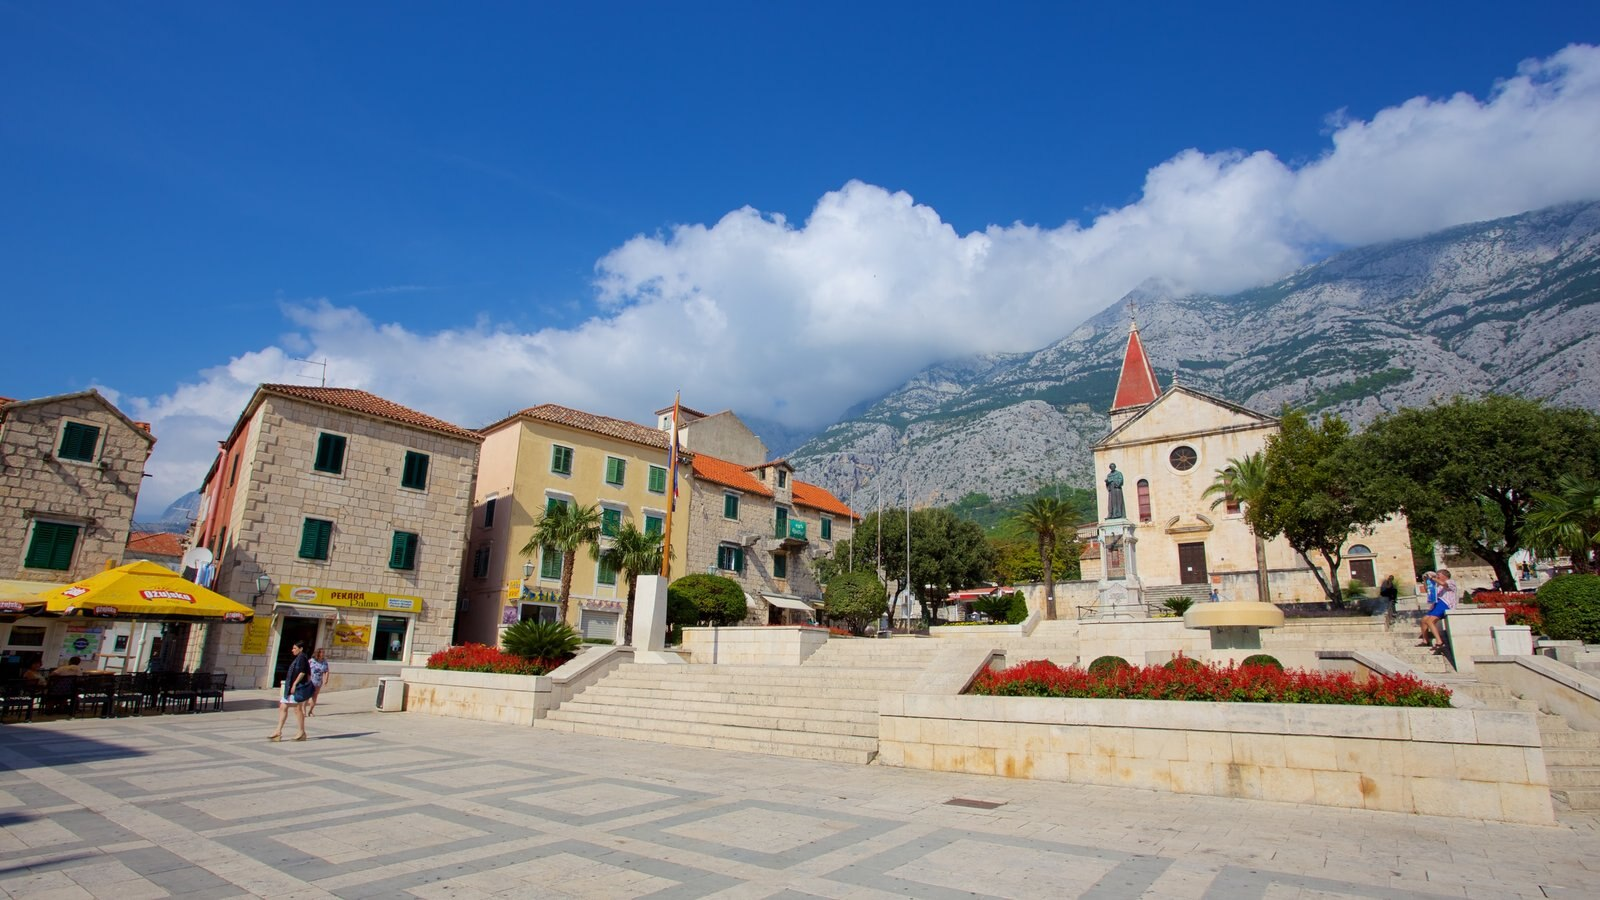 Makarska que incluye un parque o plaza